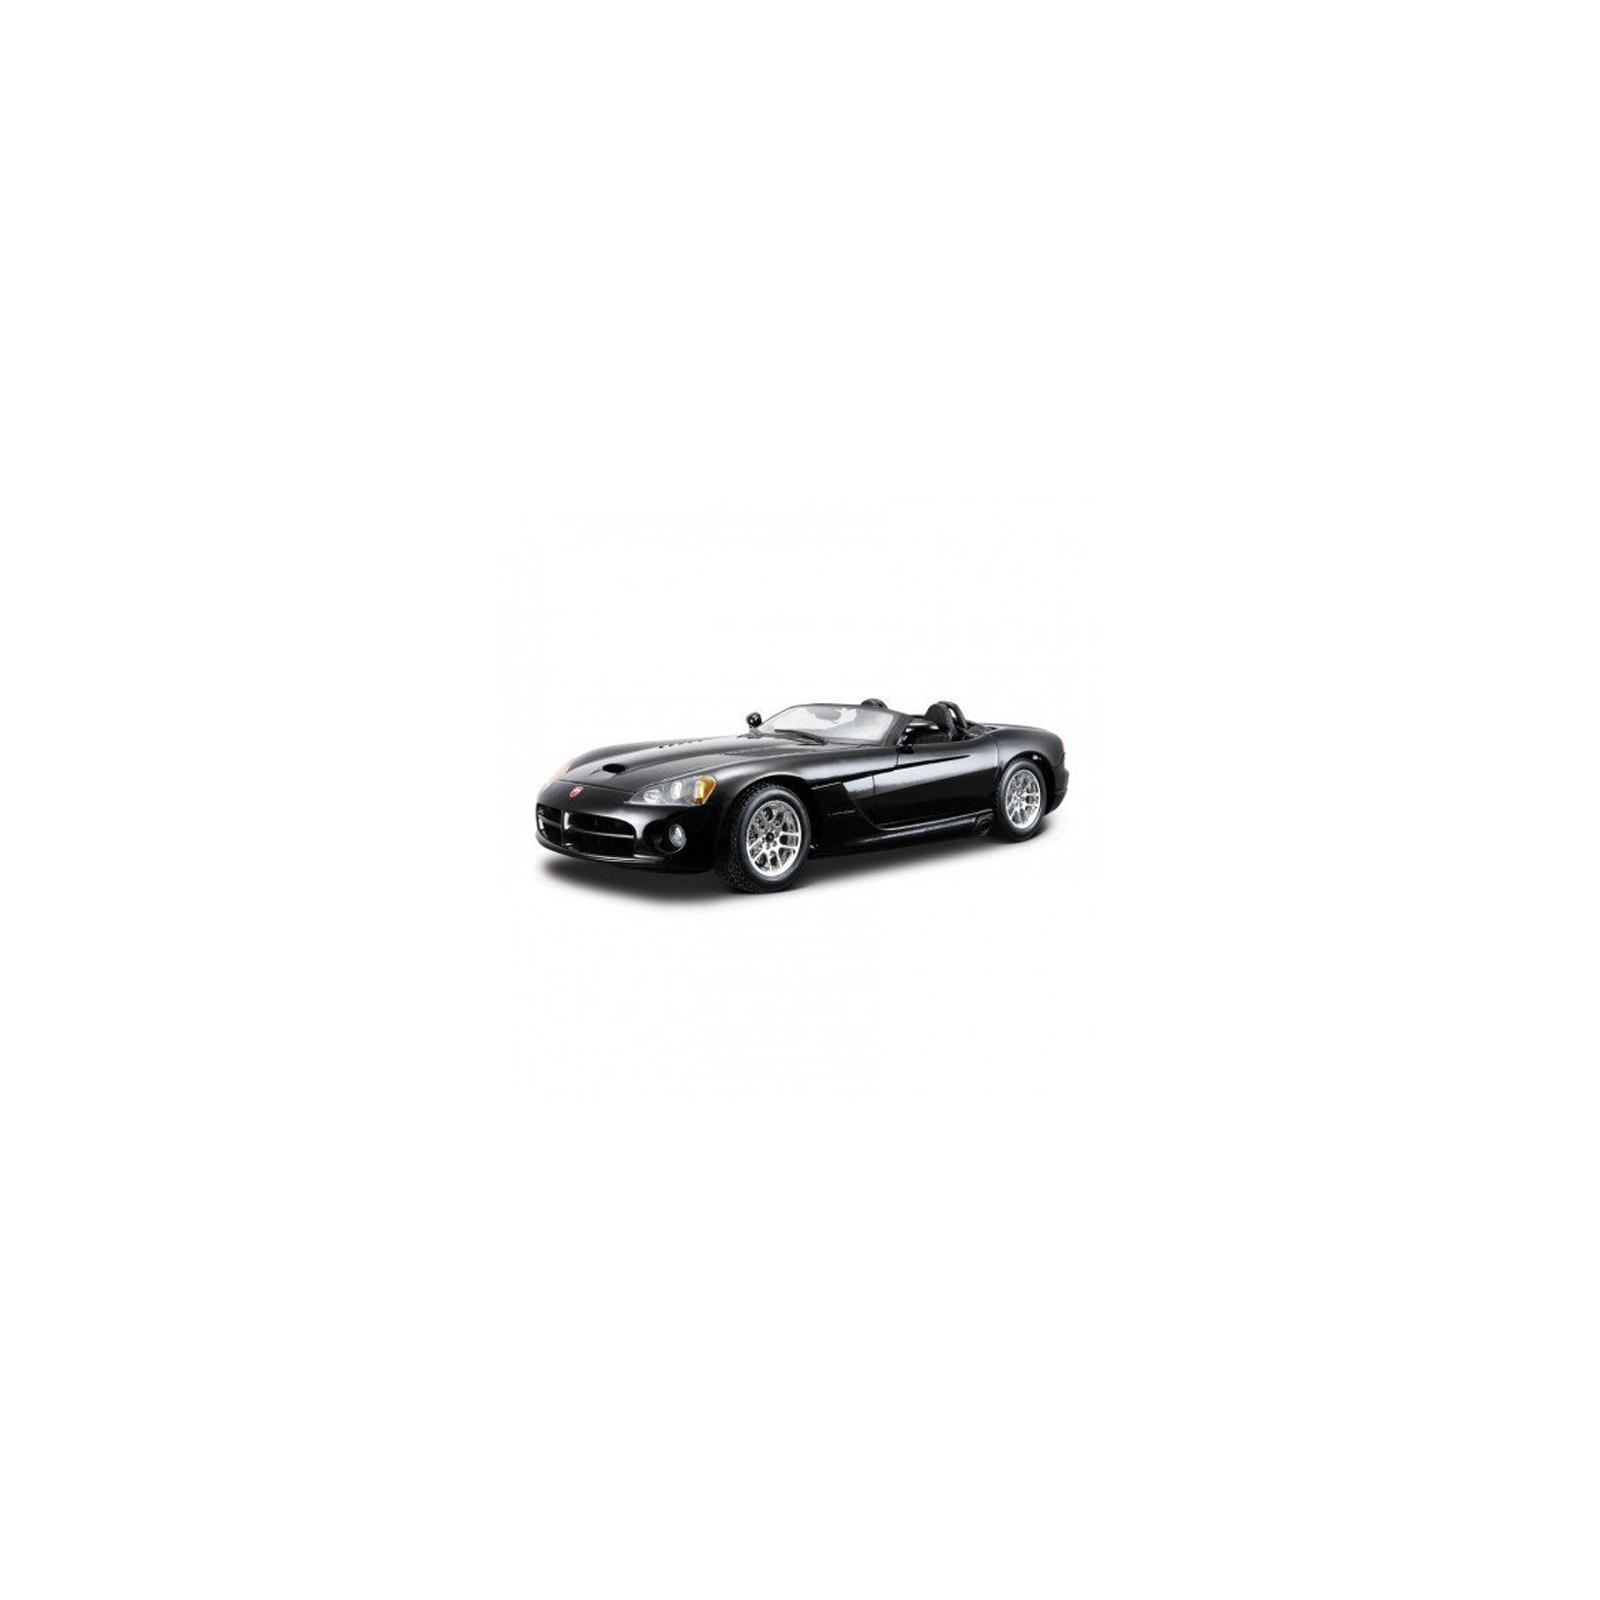 Машина Maisto Dodge Viper SRT-10 (1:24) черный (31232 black)